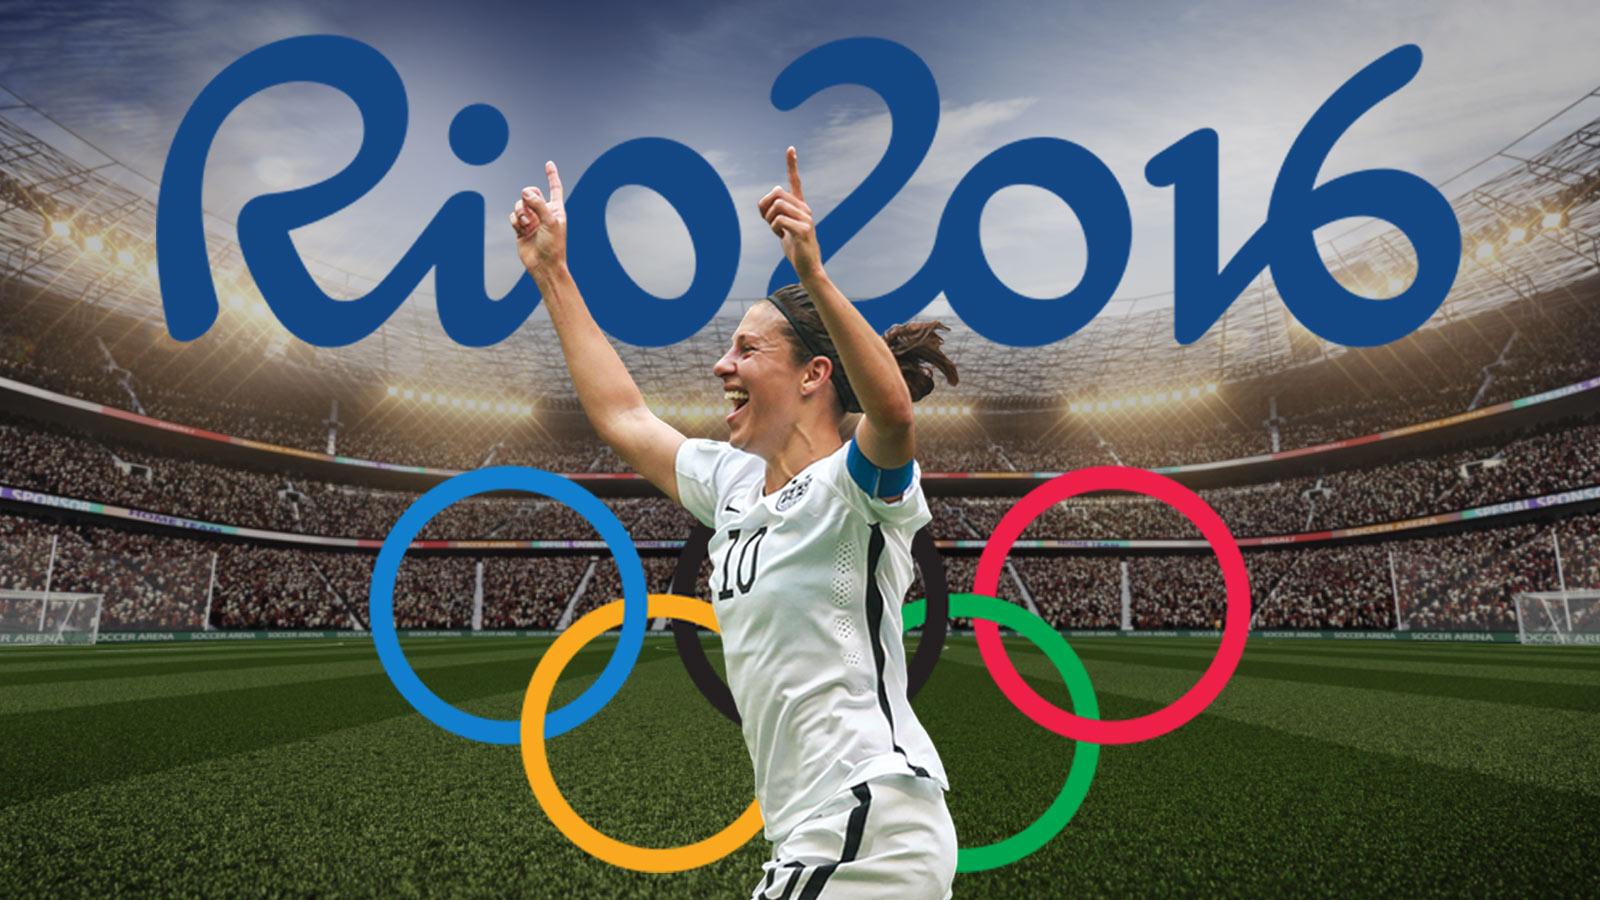 021916-Soccer-Rio-Carli-Lloyd-pi-ssm.jpg